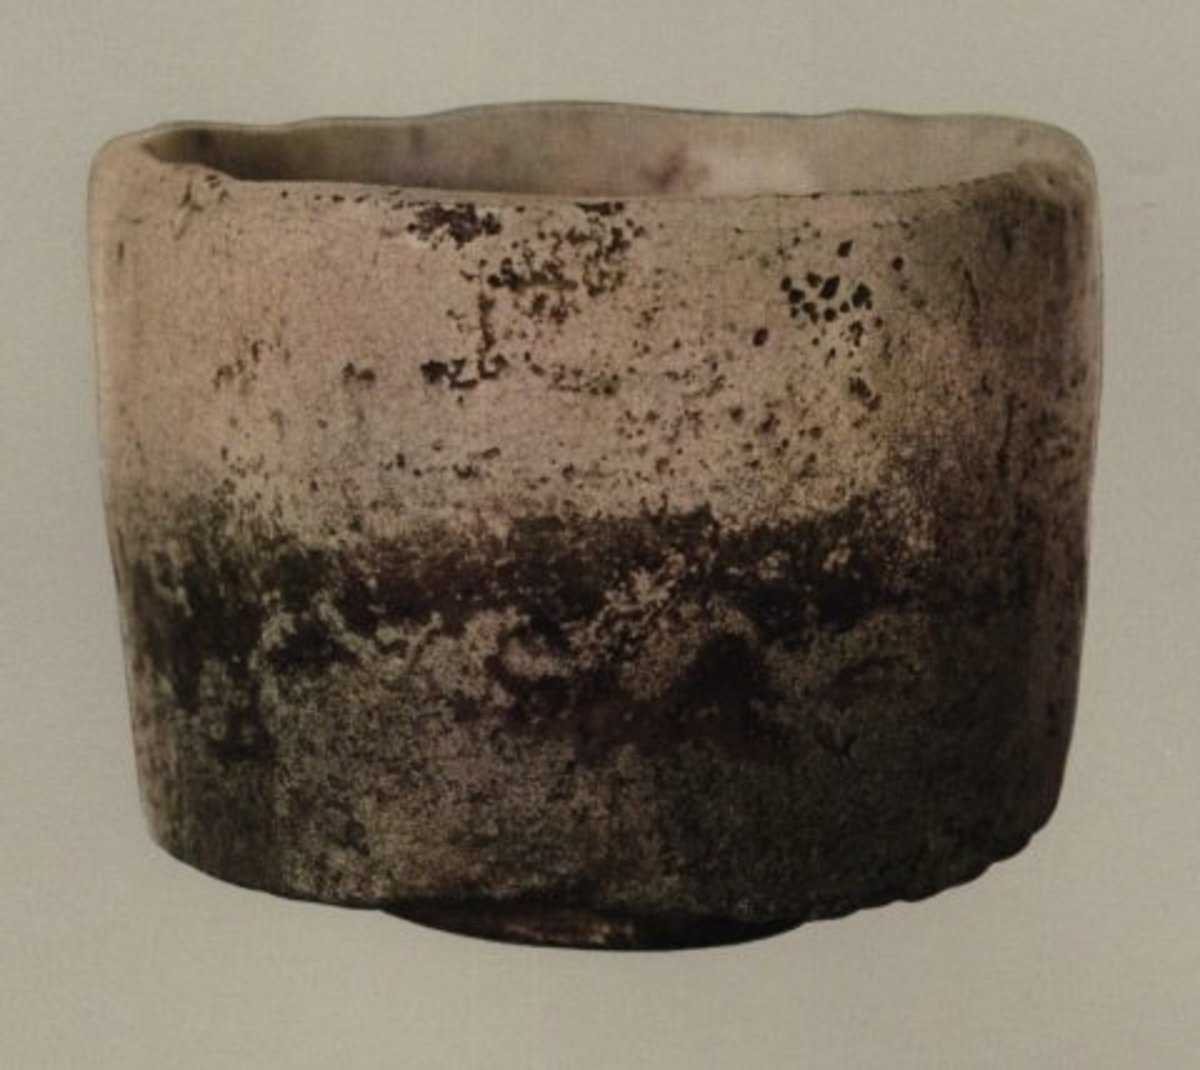 Raku Pottery in Japan